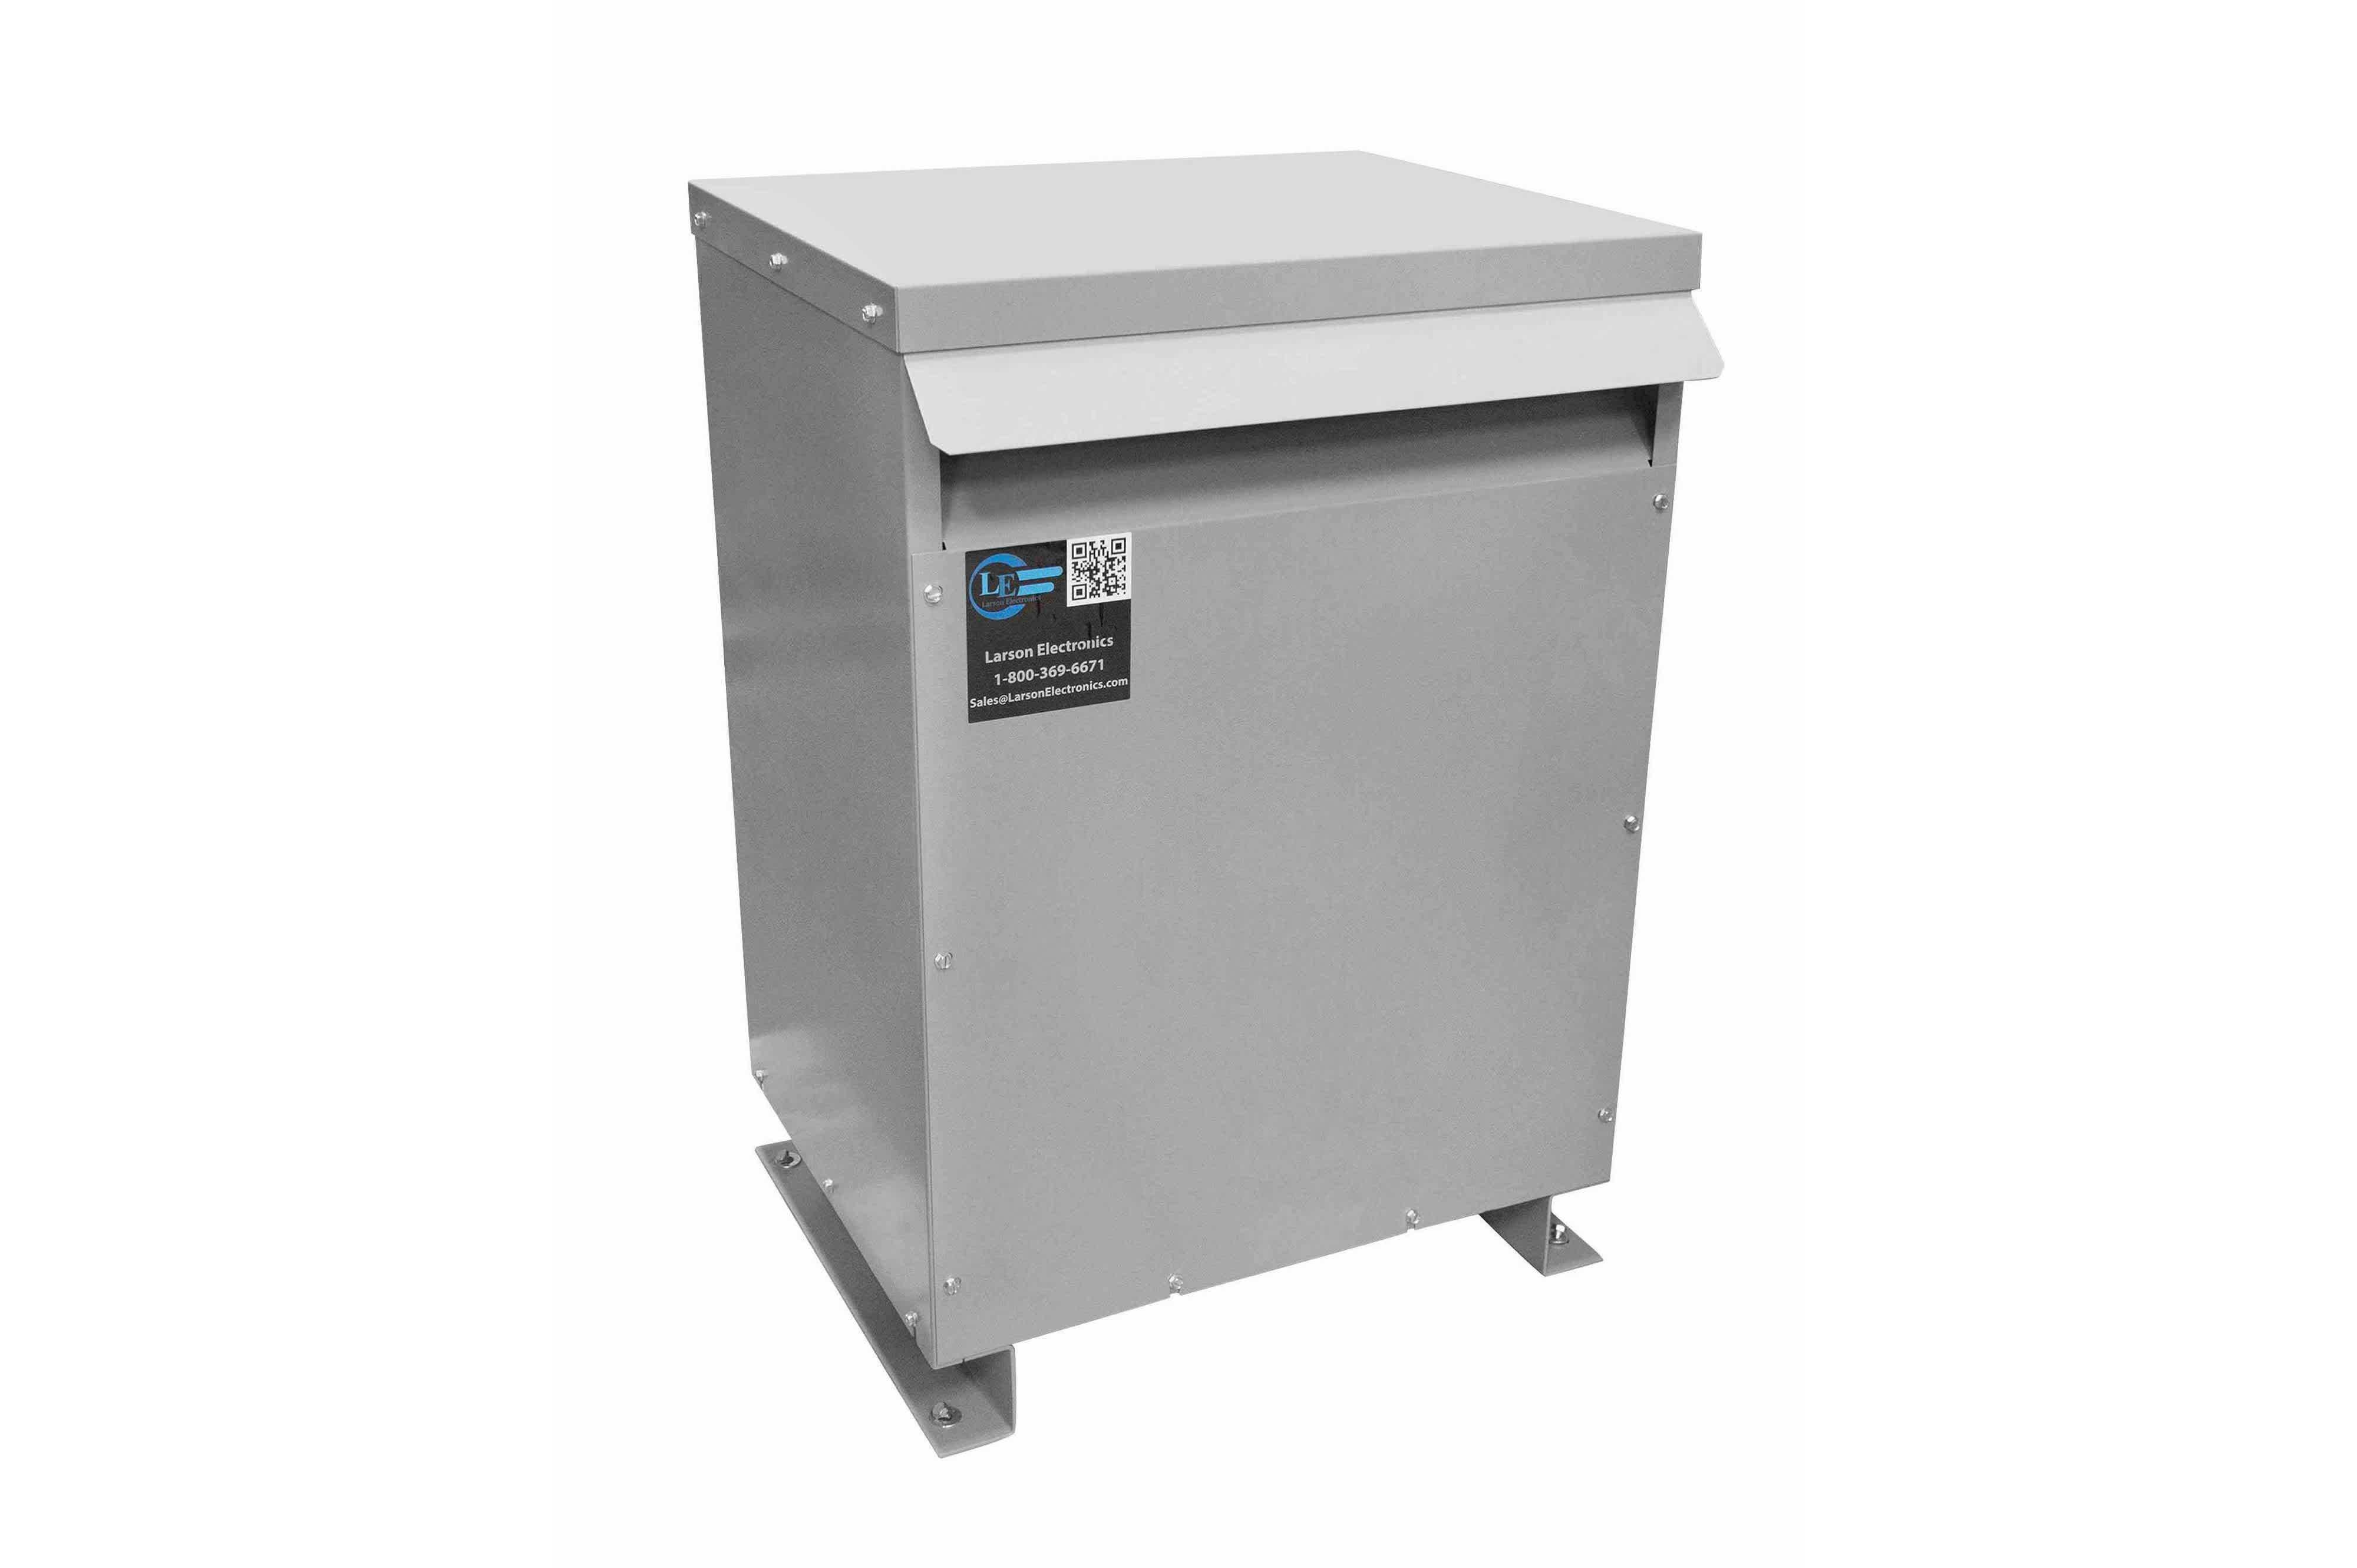 30 kVA 3PH Isolation Transformer, 460V Wye Primary, 240V Delta Secondary, N3R, Ventilated, 60 Hz